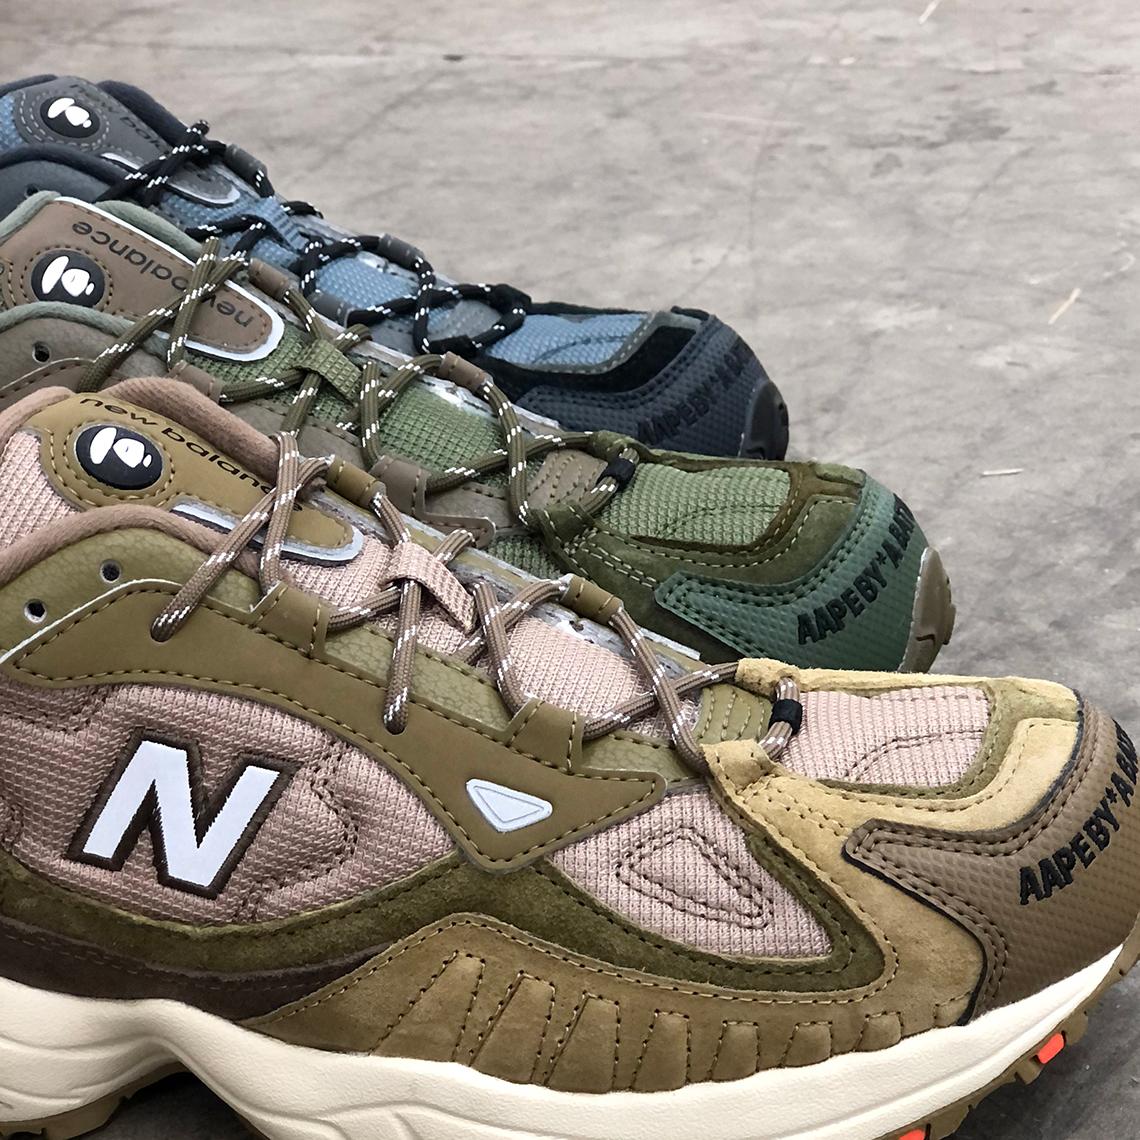 AAPE New Balance 703 Release Date | SneakerNews.com